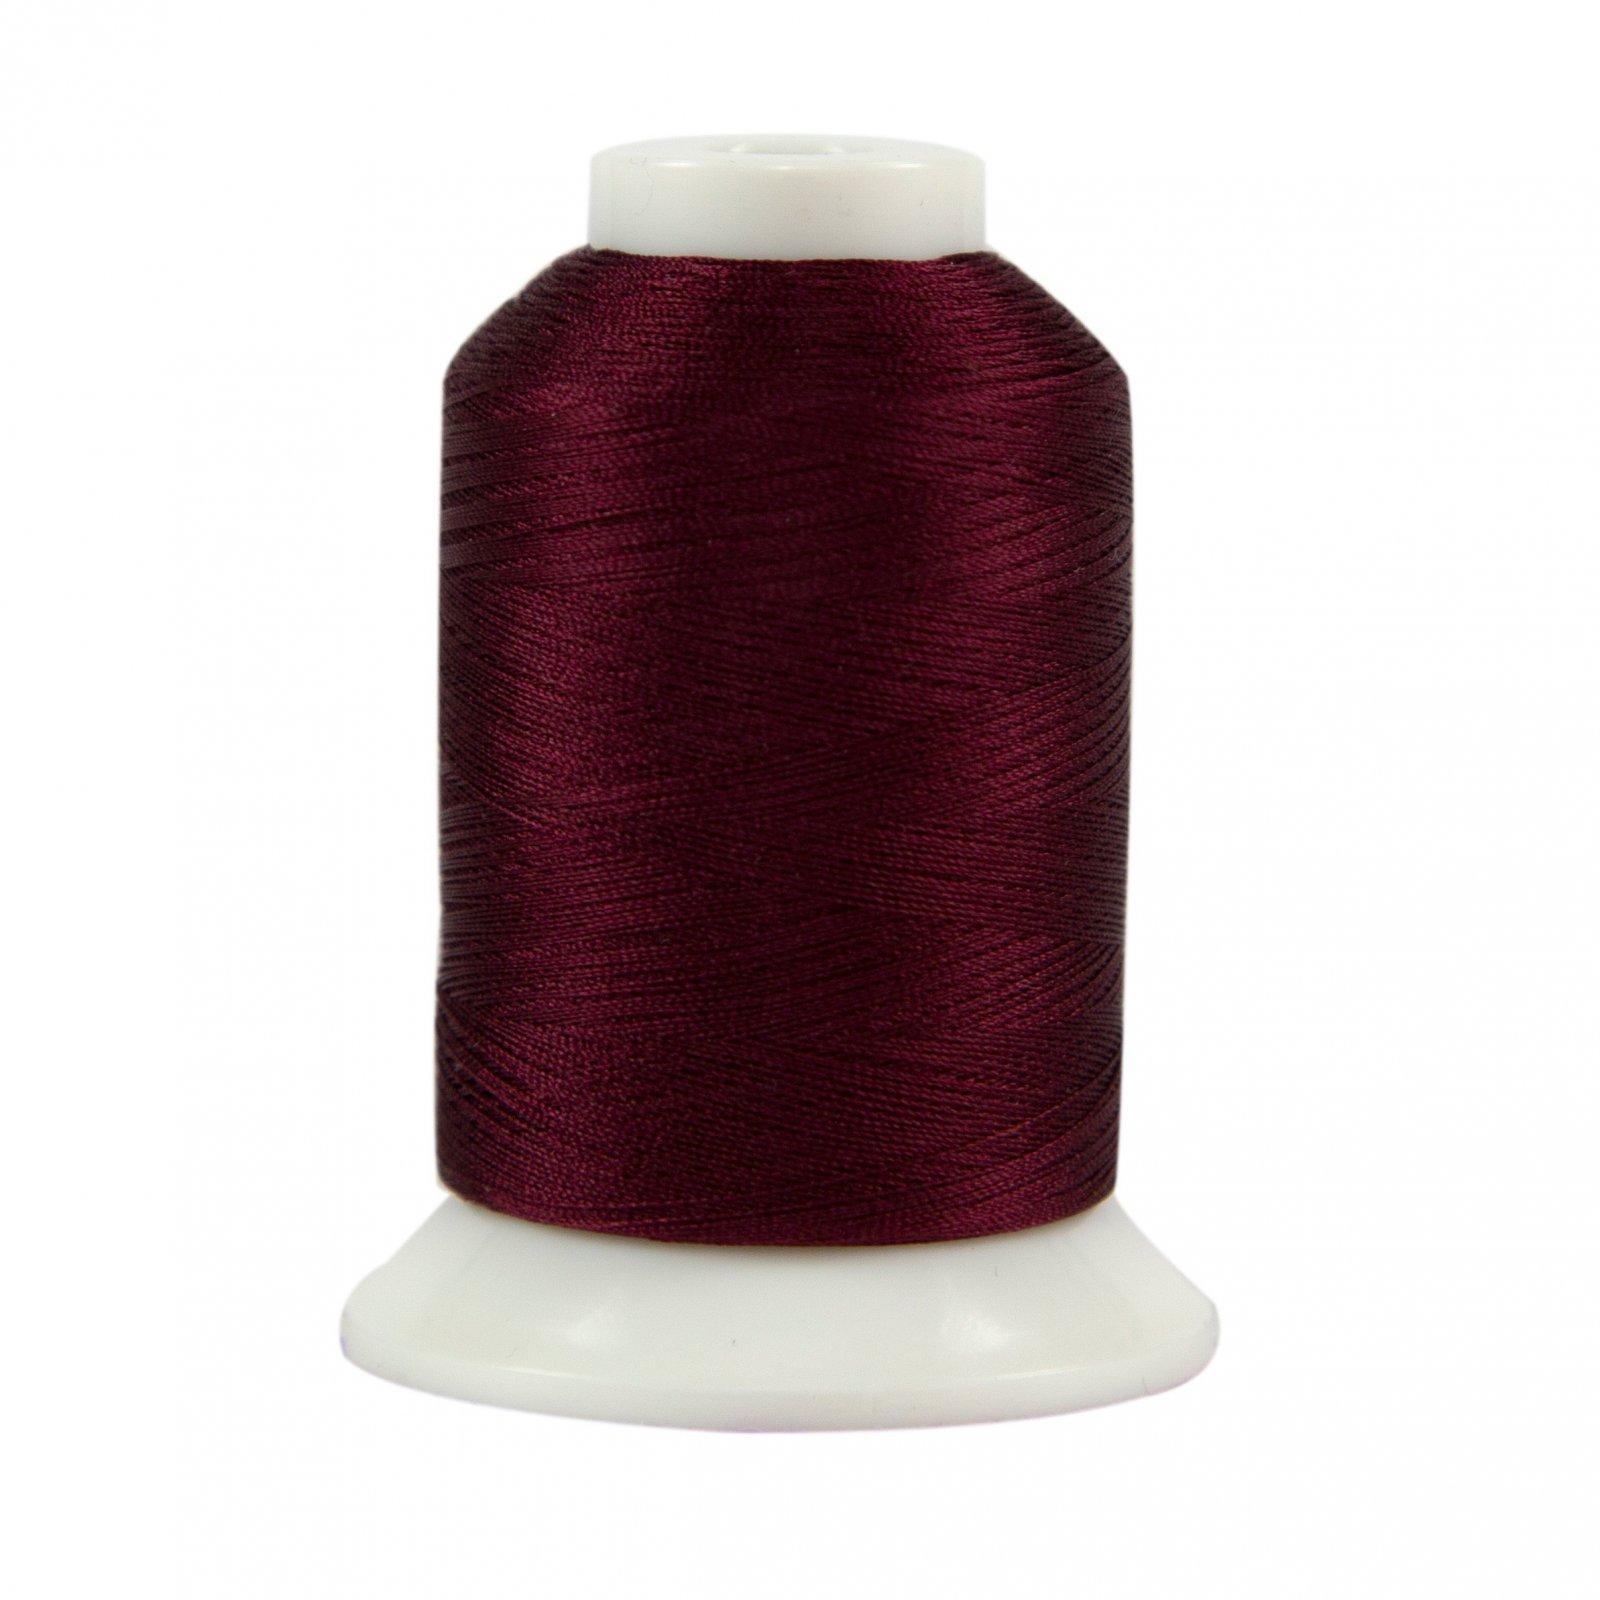 Kimono Silk Thread 100wt 1090yd Raspberry Truffle